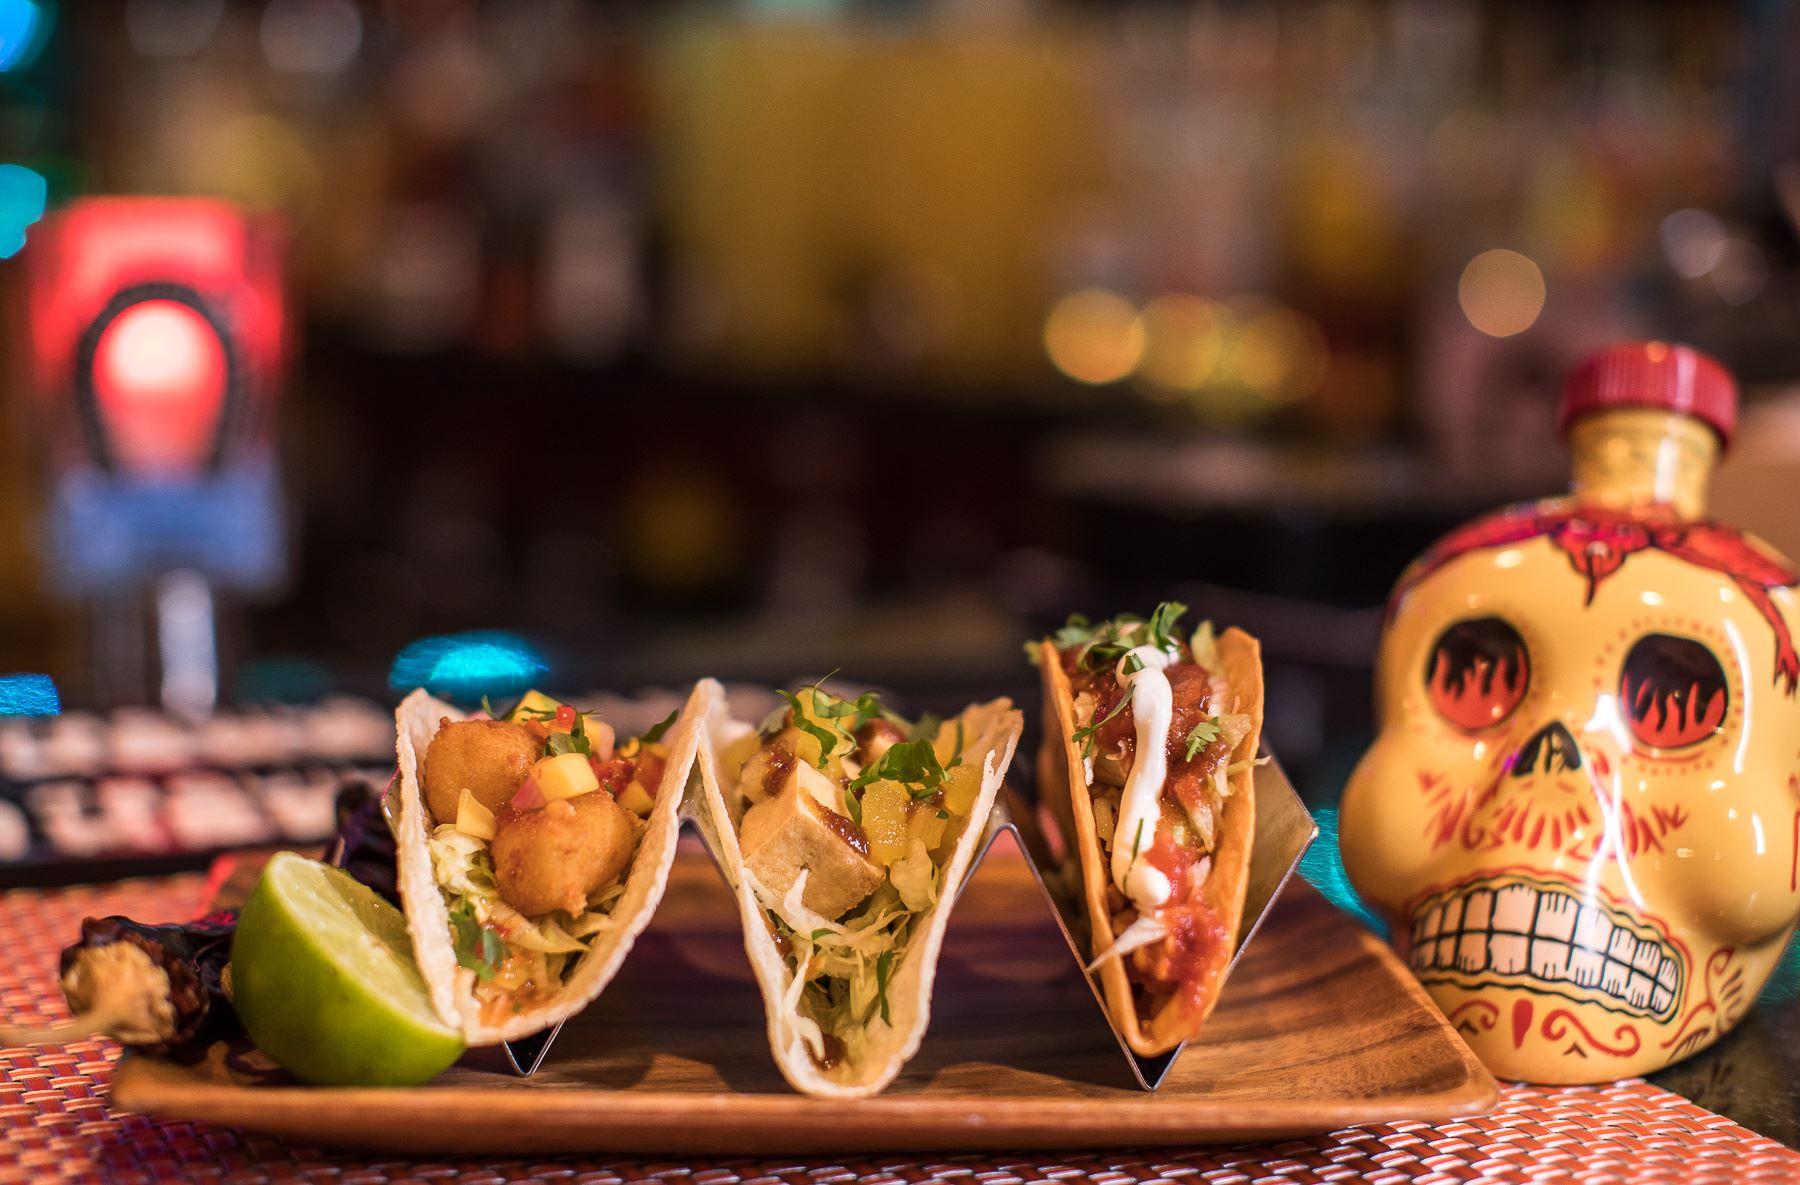 Taco Cantina Tacos and Alcohol